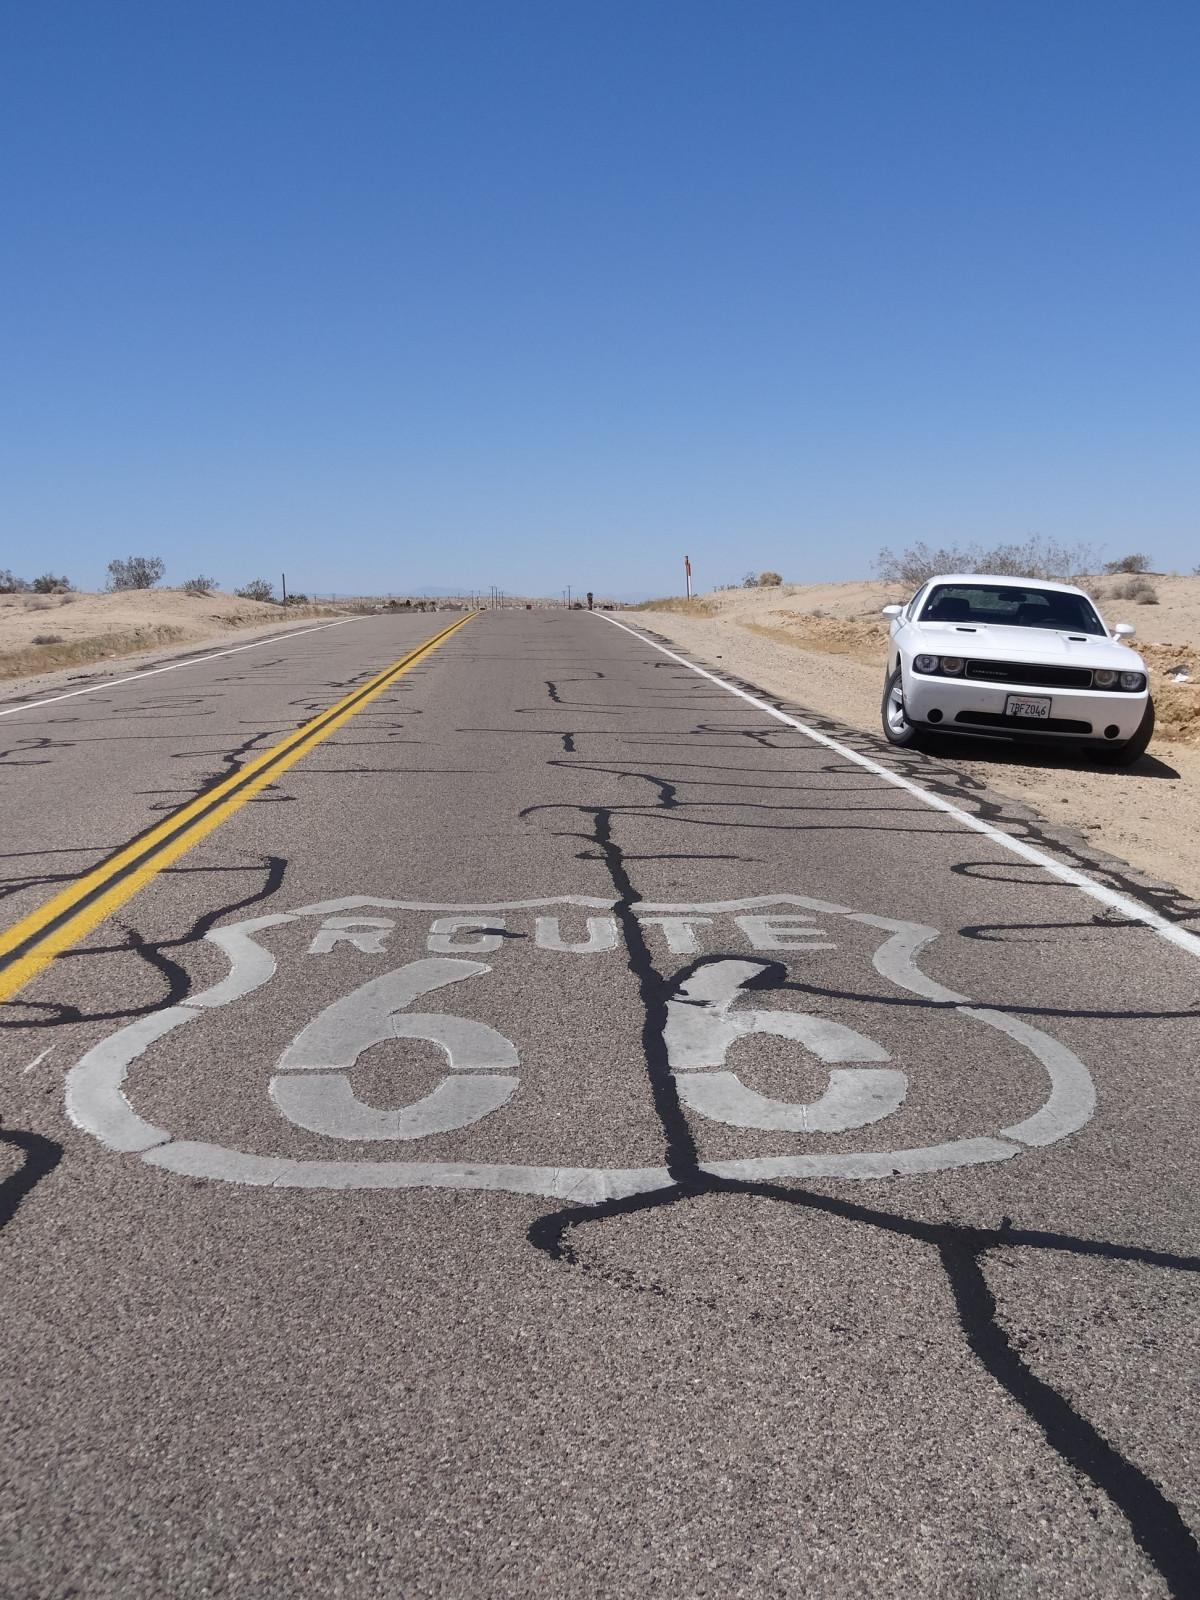 sand sky road car desert highway Free